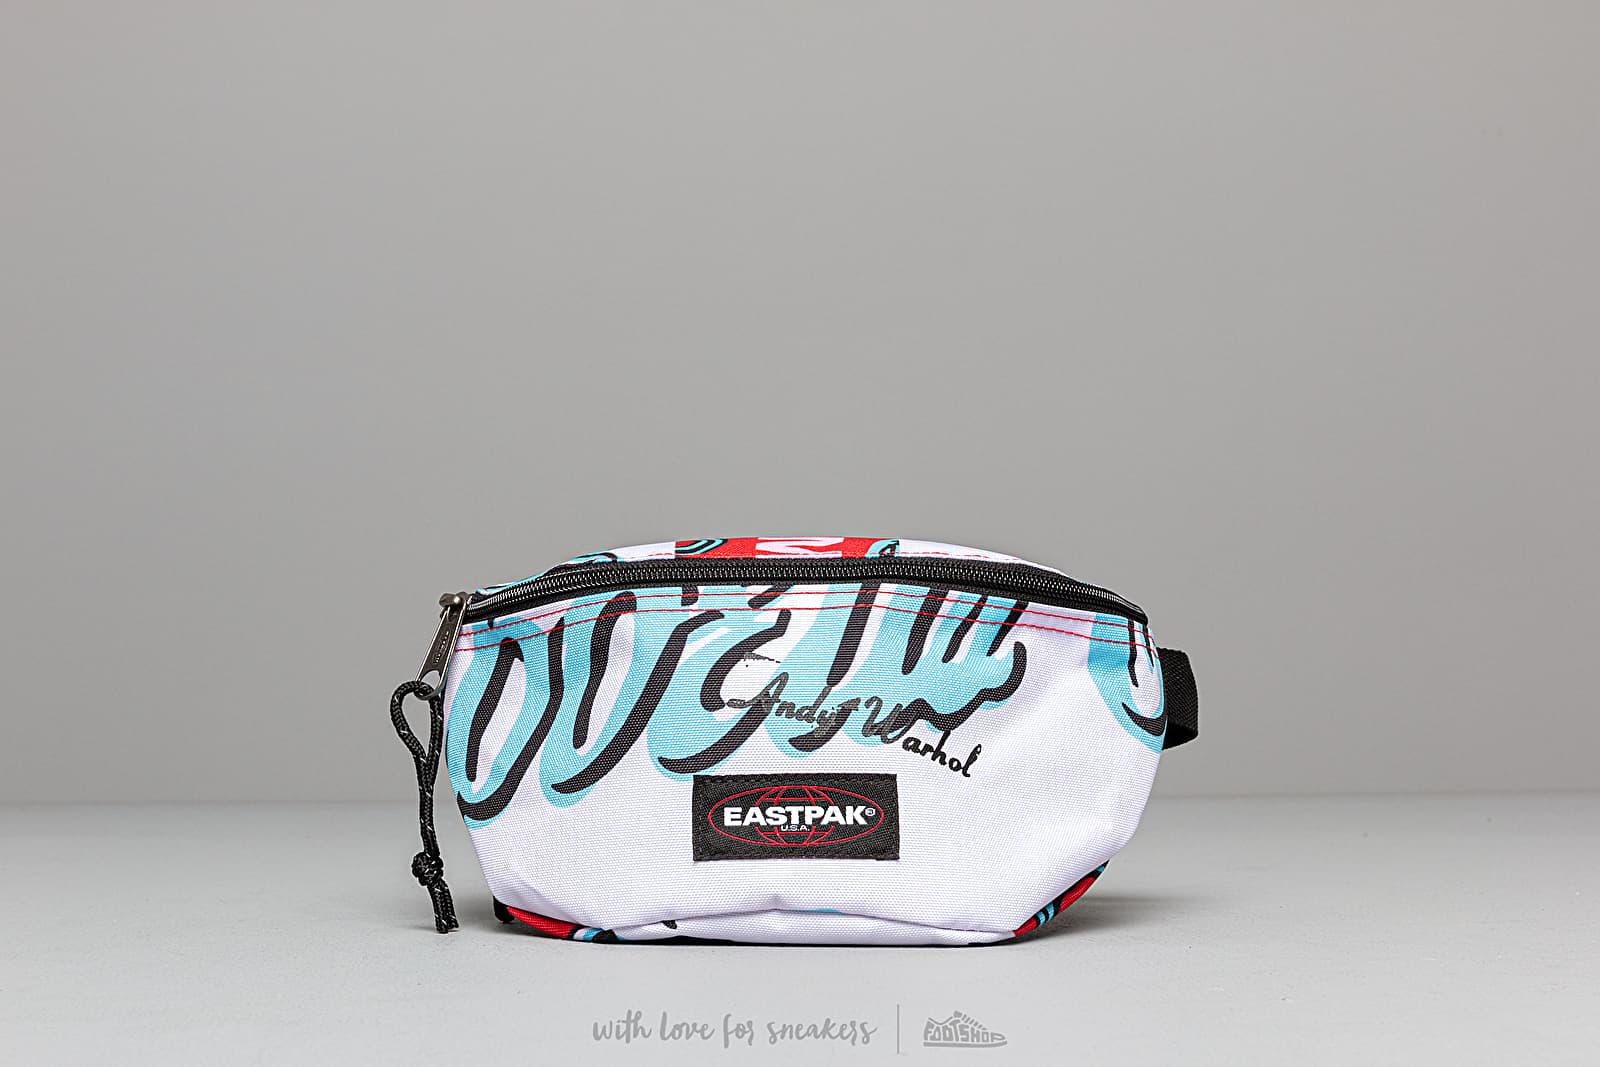 EASTPAK x Andy Warhol Springer Waistbag